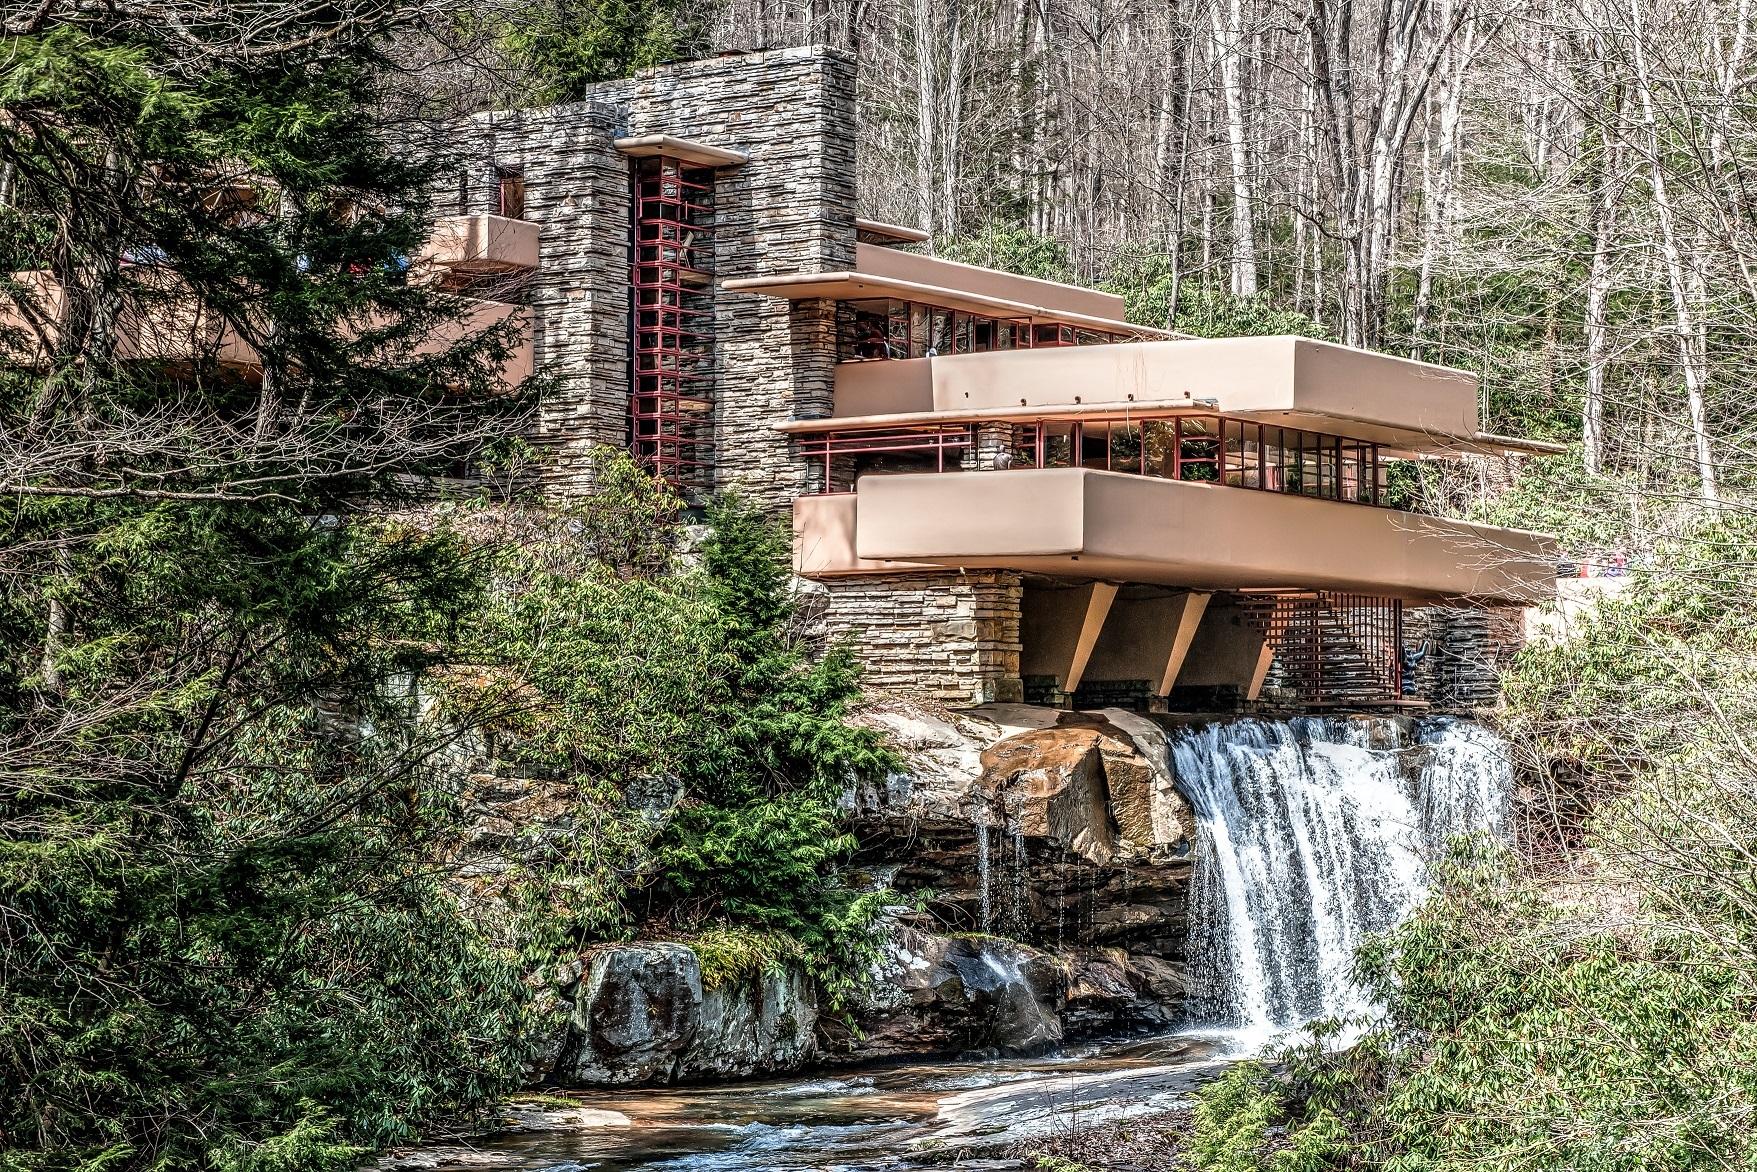 Frank Lloyd Wright's Fallingwater house HDR